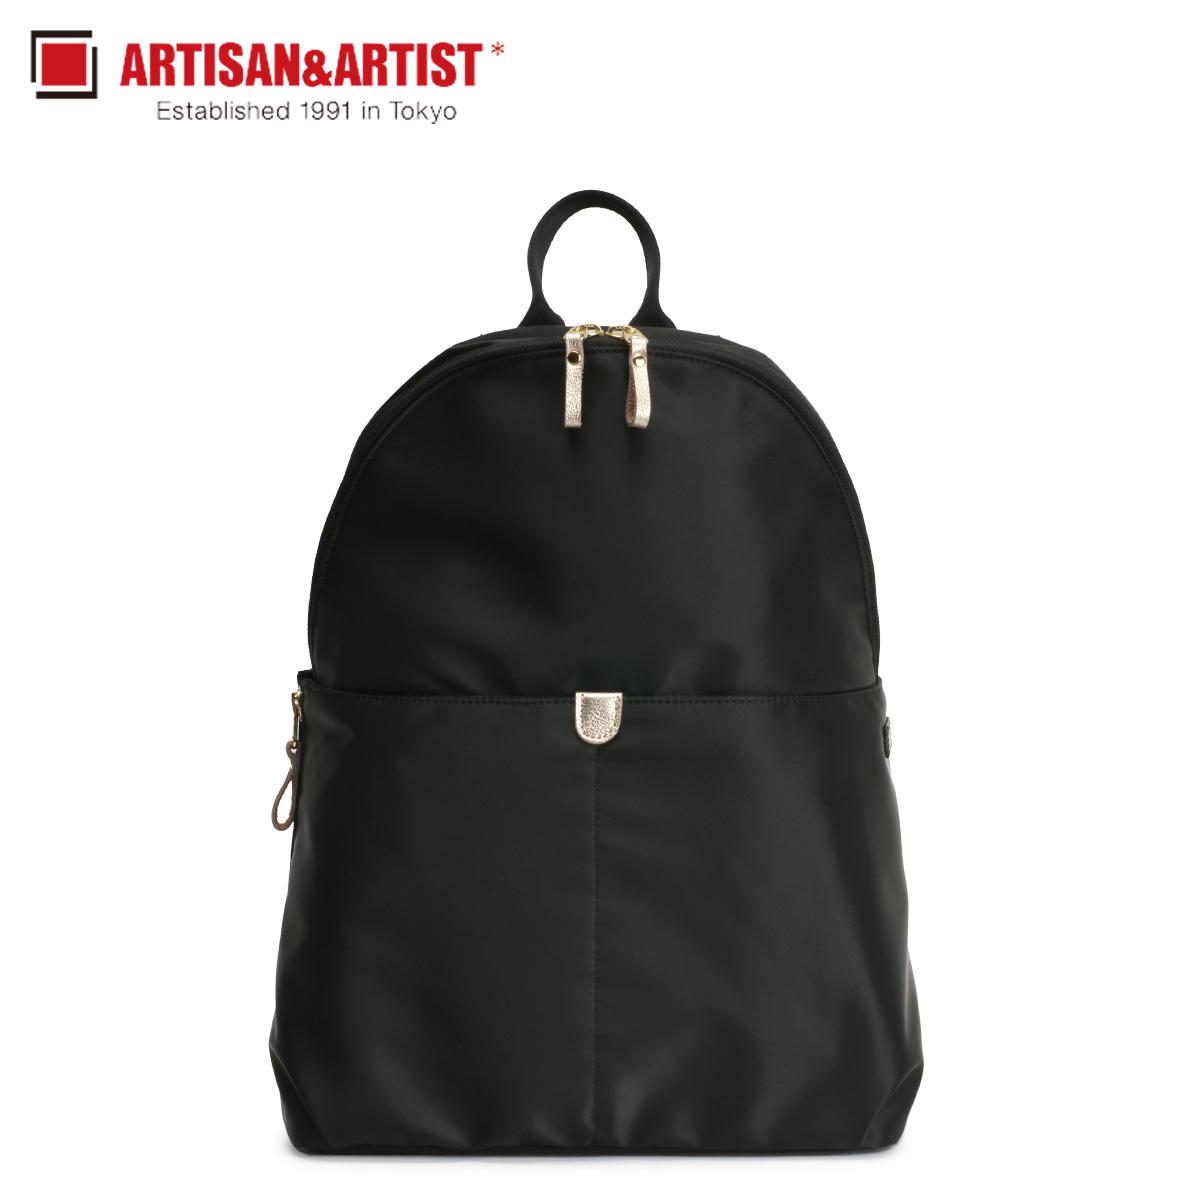 ARTISAN&ARTIST アルティザン&アーティスト リュック バッグ バックパック レディース NEW SLIM ブラック 黒 8WB-NS01